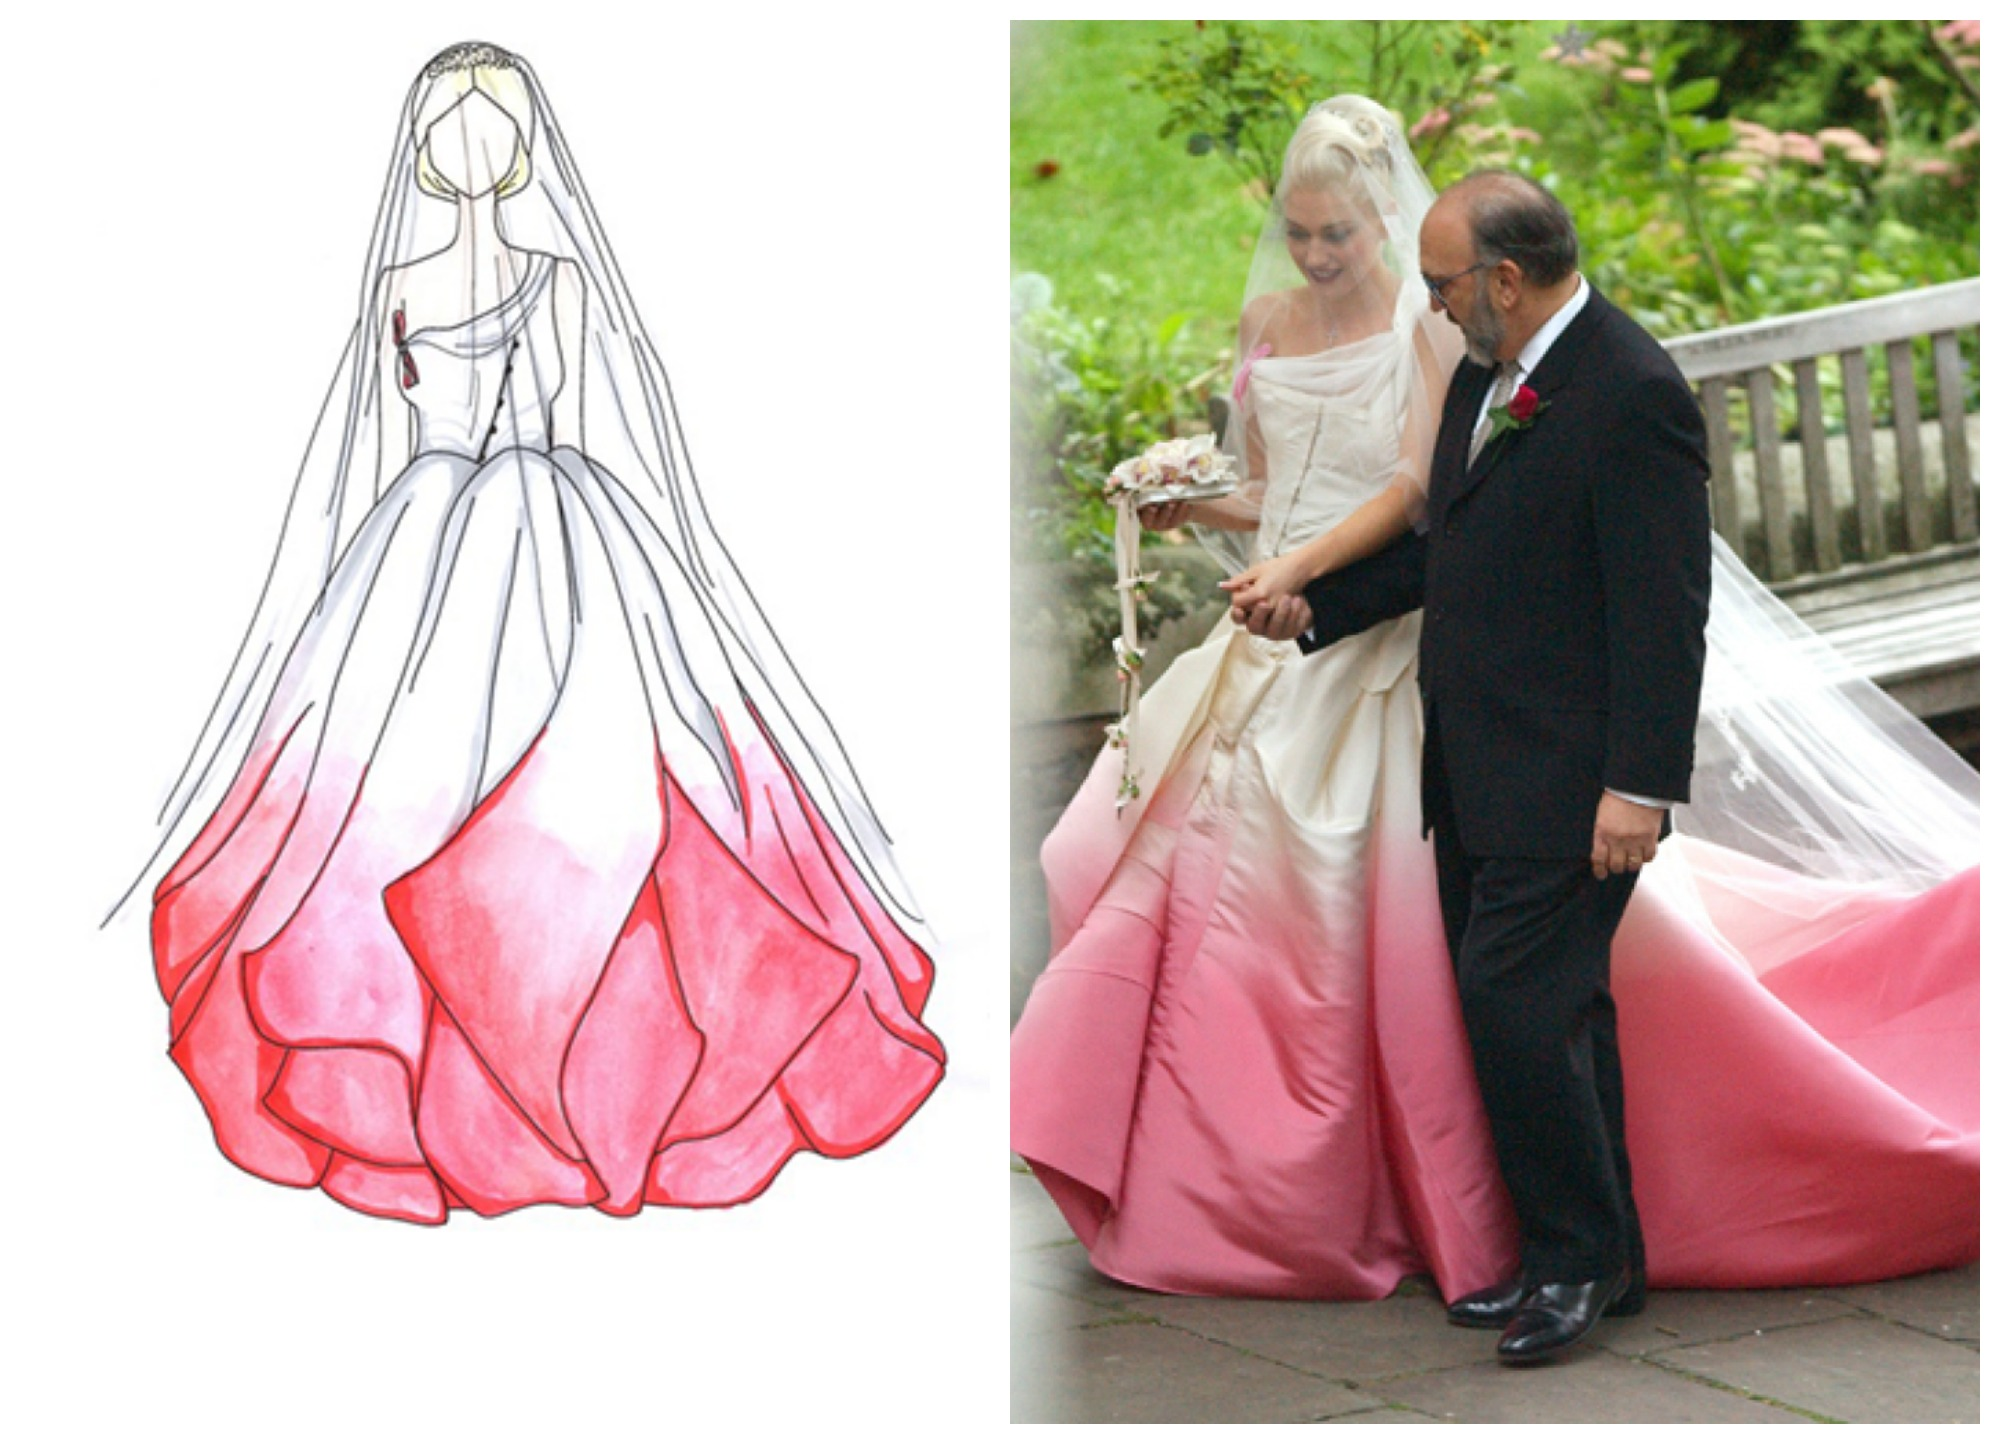 Gizet dresses collection gwen stefani wedding dress images gwen stefani wedding dress images junglespirit Gallery